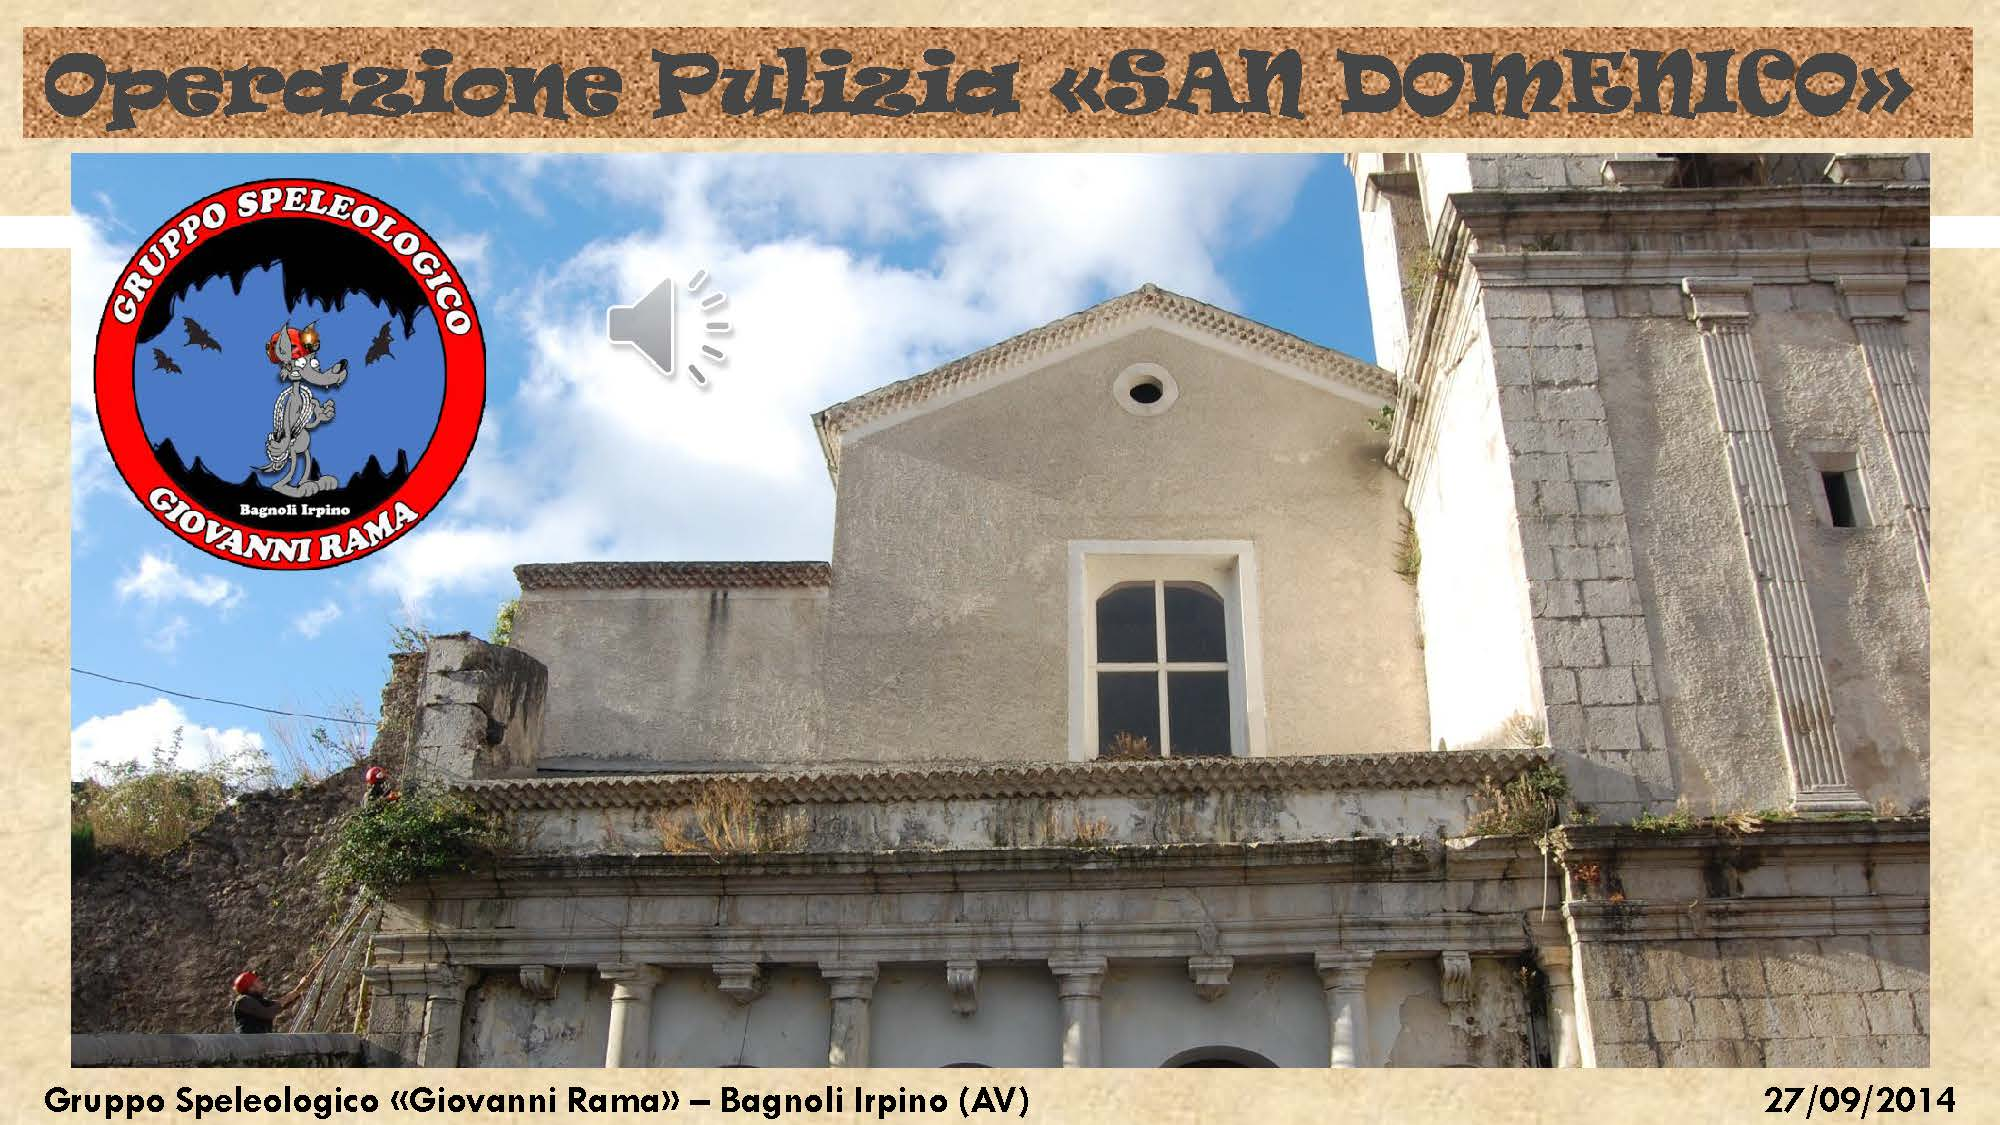 Bagnoli-Pulizia-San-Domenico-2014_Pagina_01